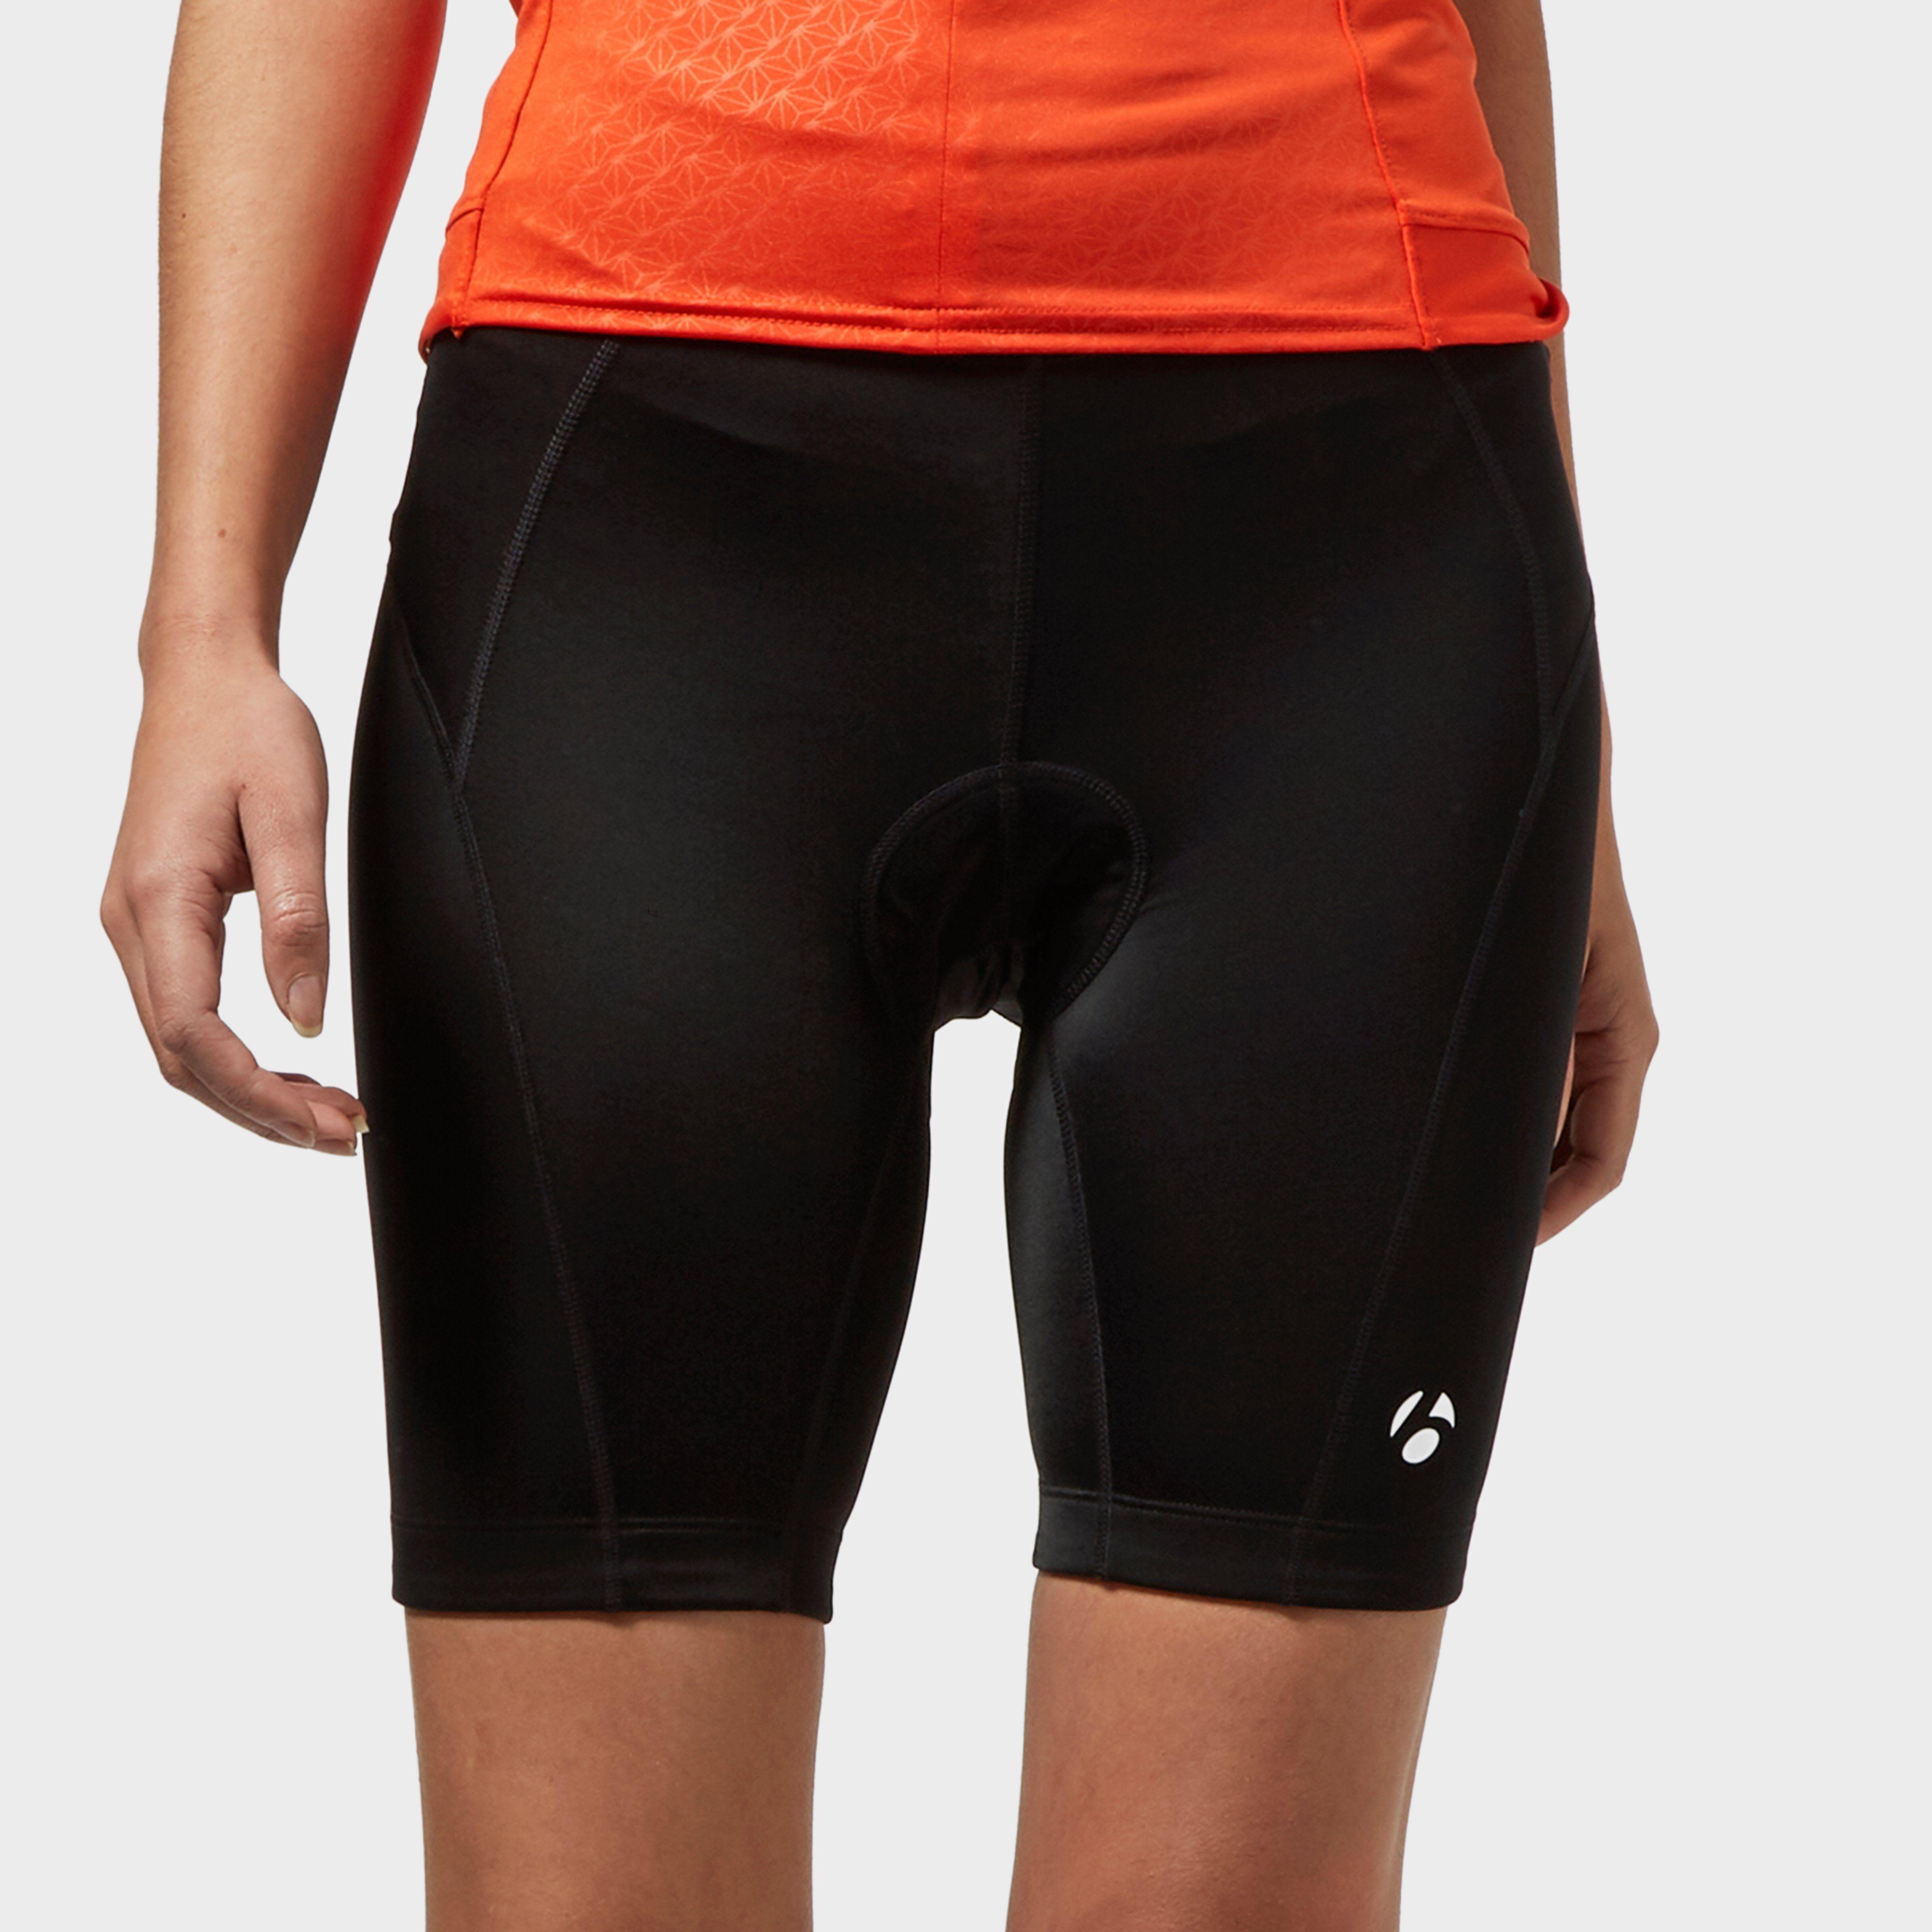 BONTRAGER Women's Solaris Cycle Shorts